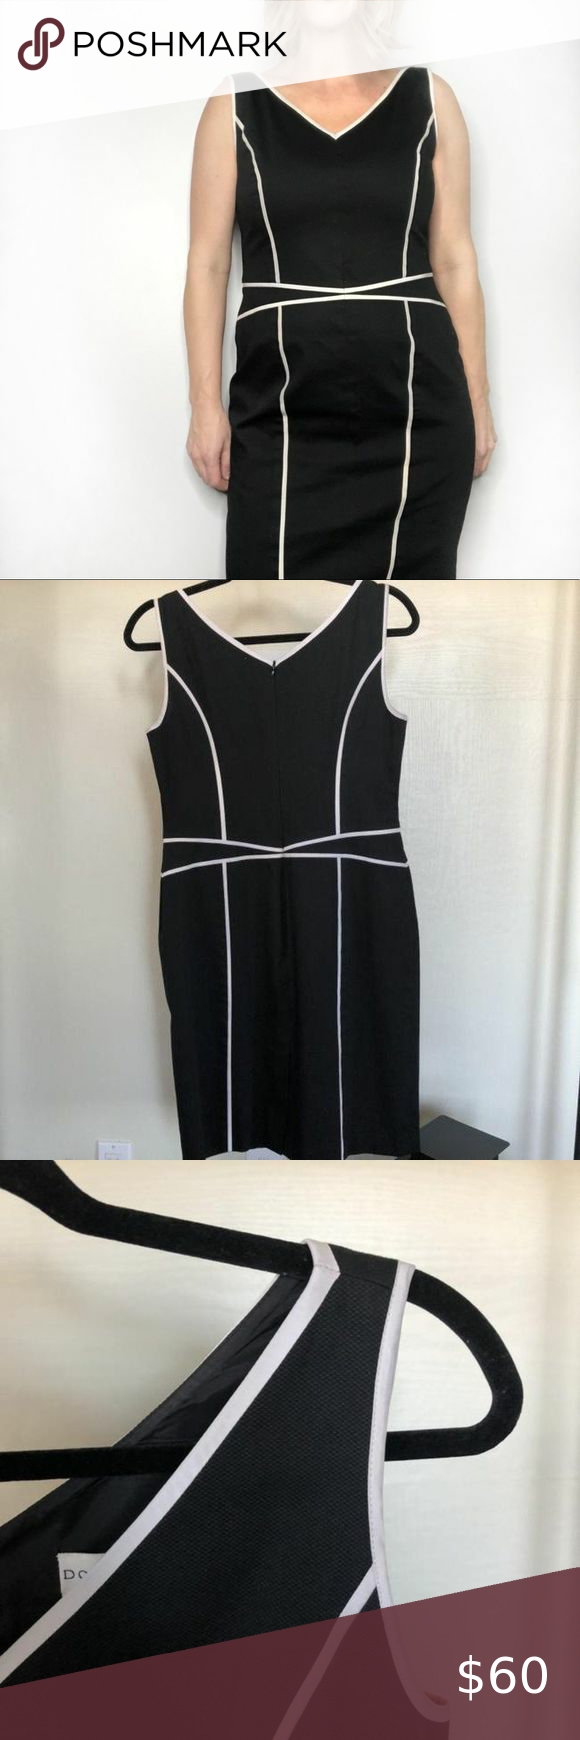 Doncaster Black And White Sheath Classy Super Nice Black Cotton Blend Sheath Dress With White Trim By Doncaster Fashion Dress Size Chart Women Long Blue Dress [ 1740 x 580 Pixel ]